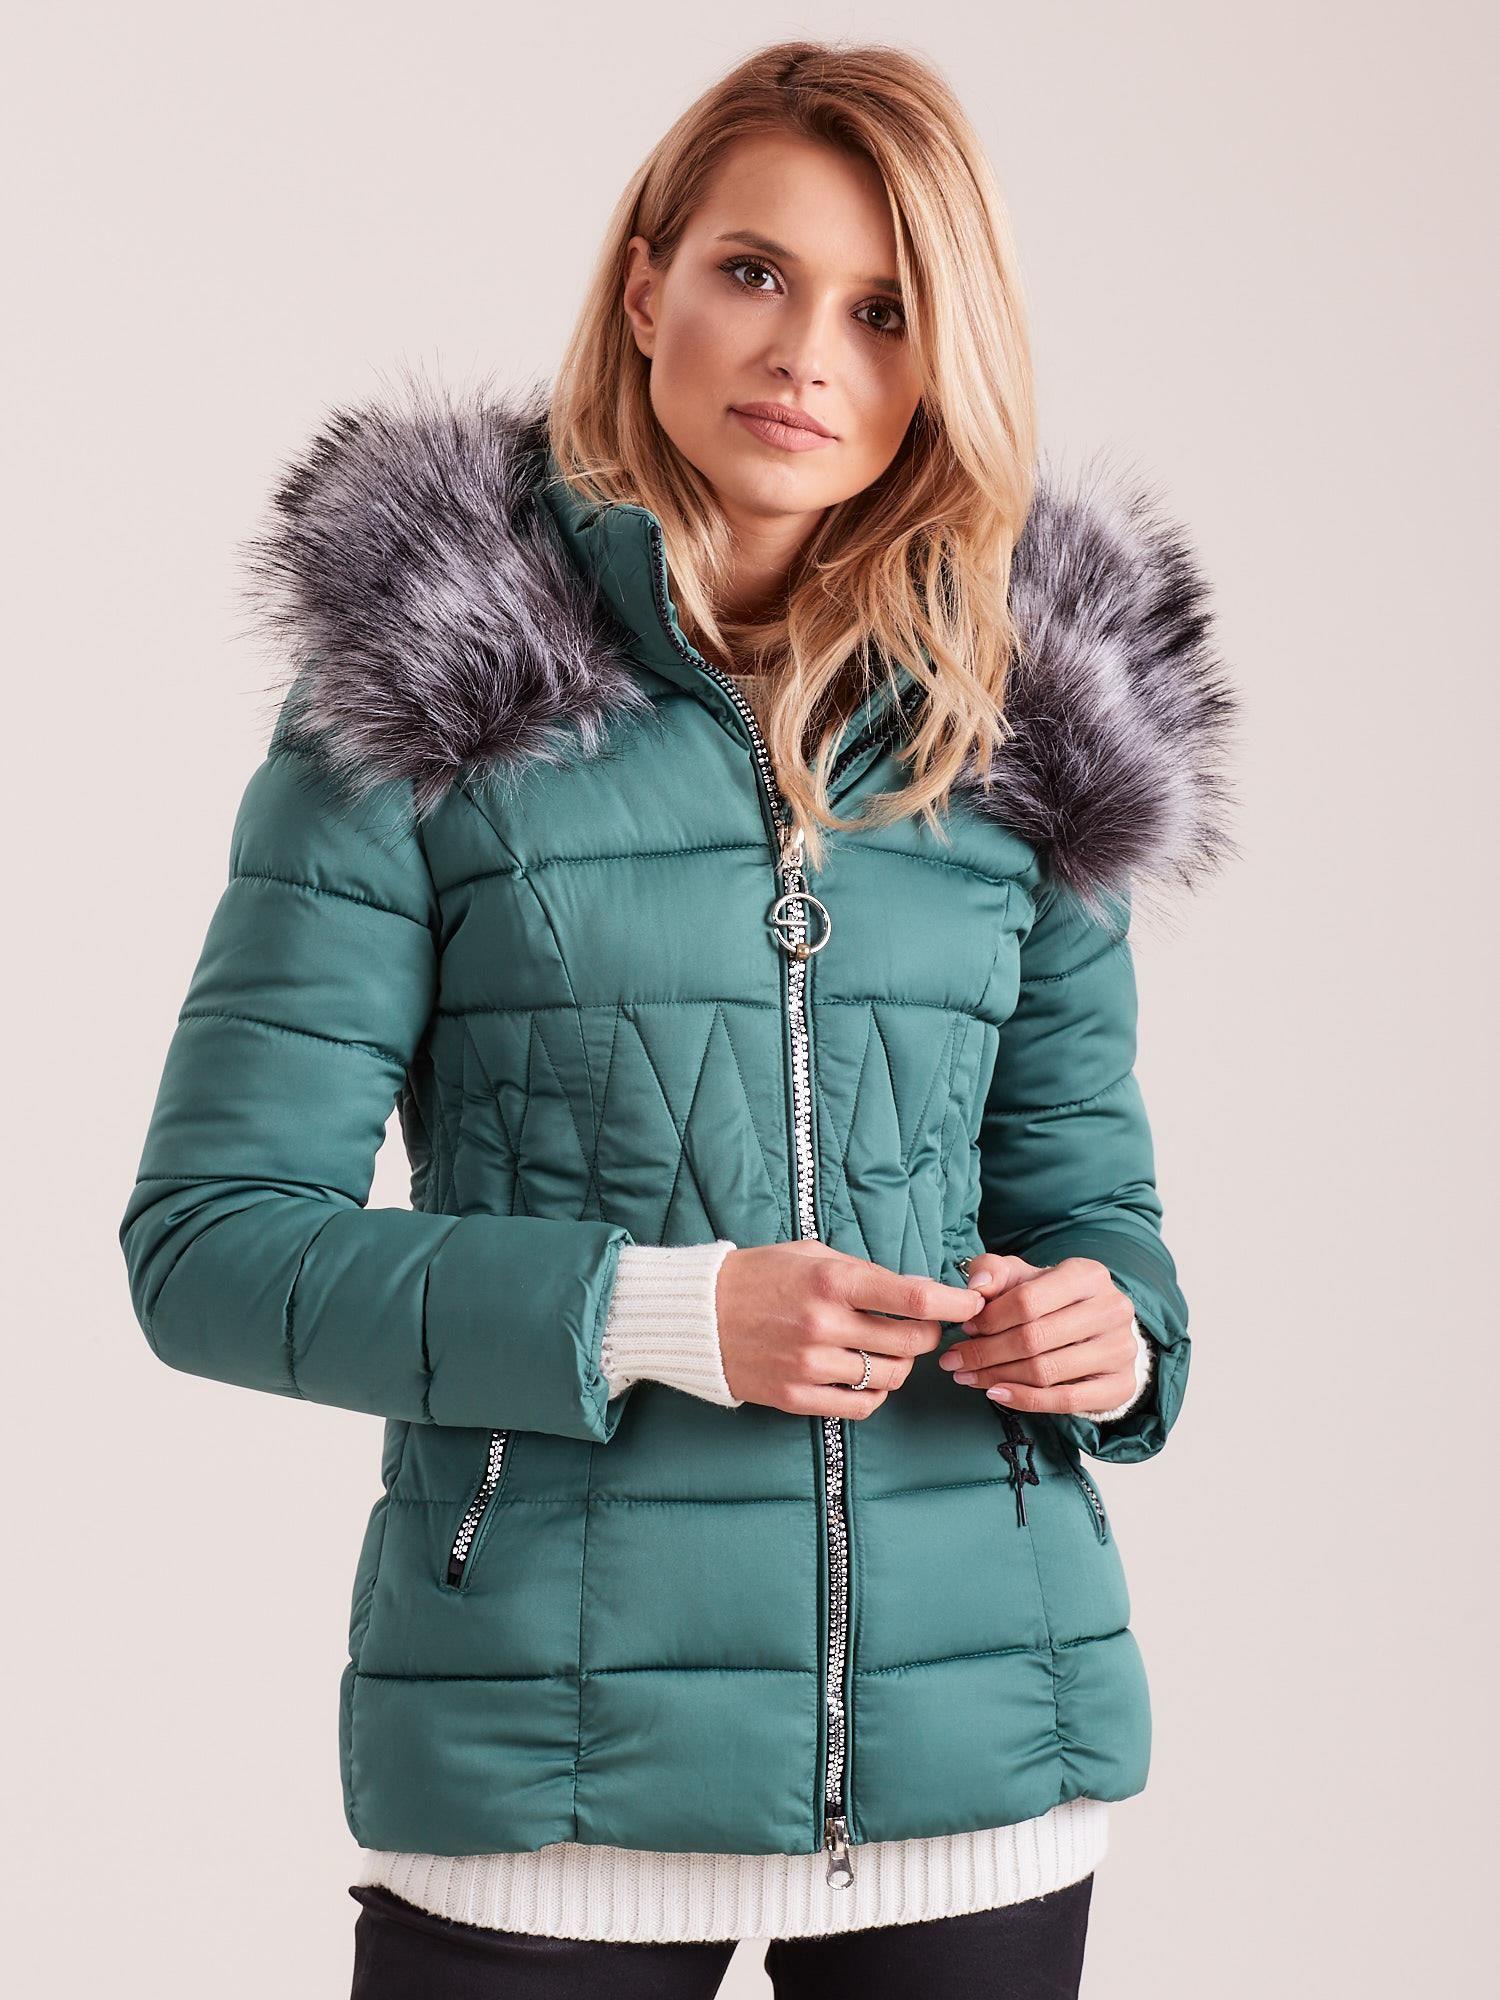 Zielona pikowana kurtka damska